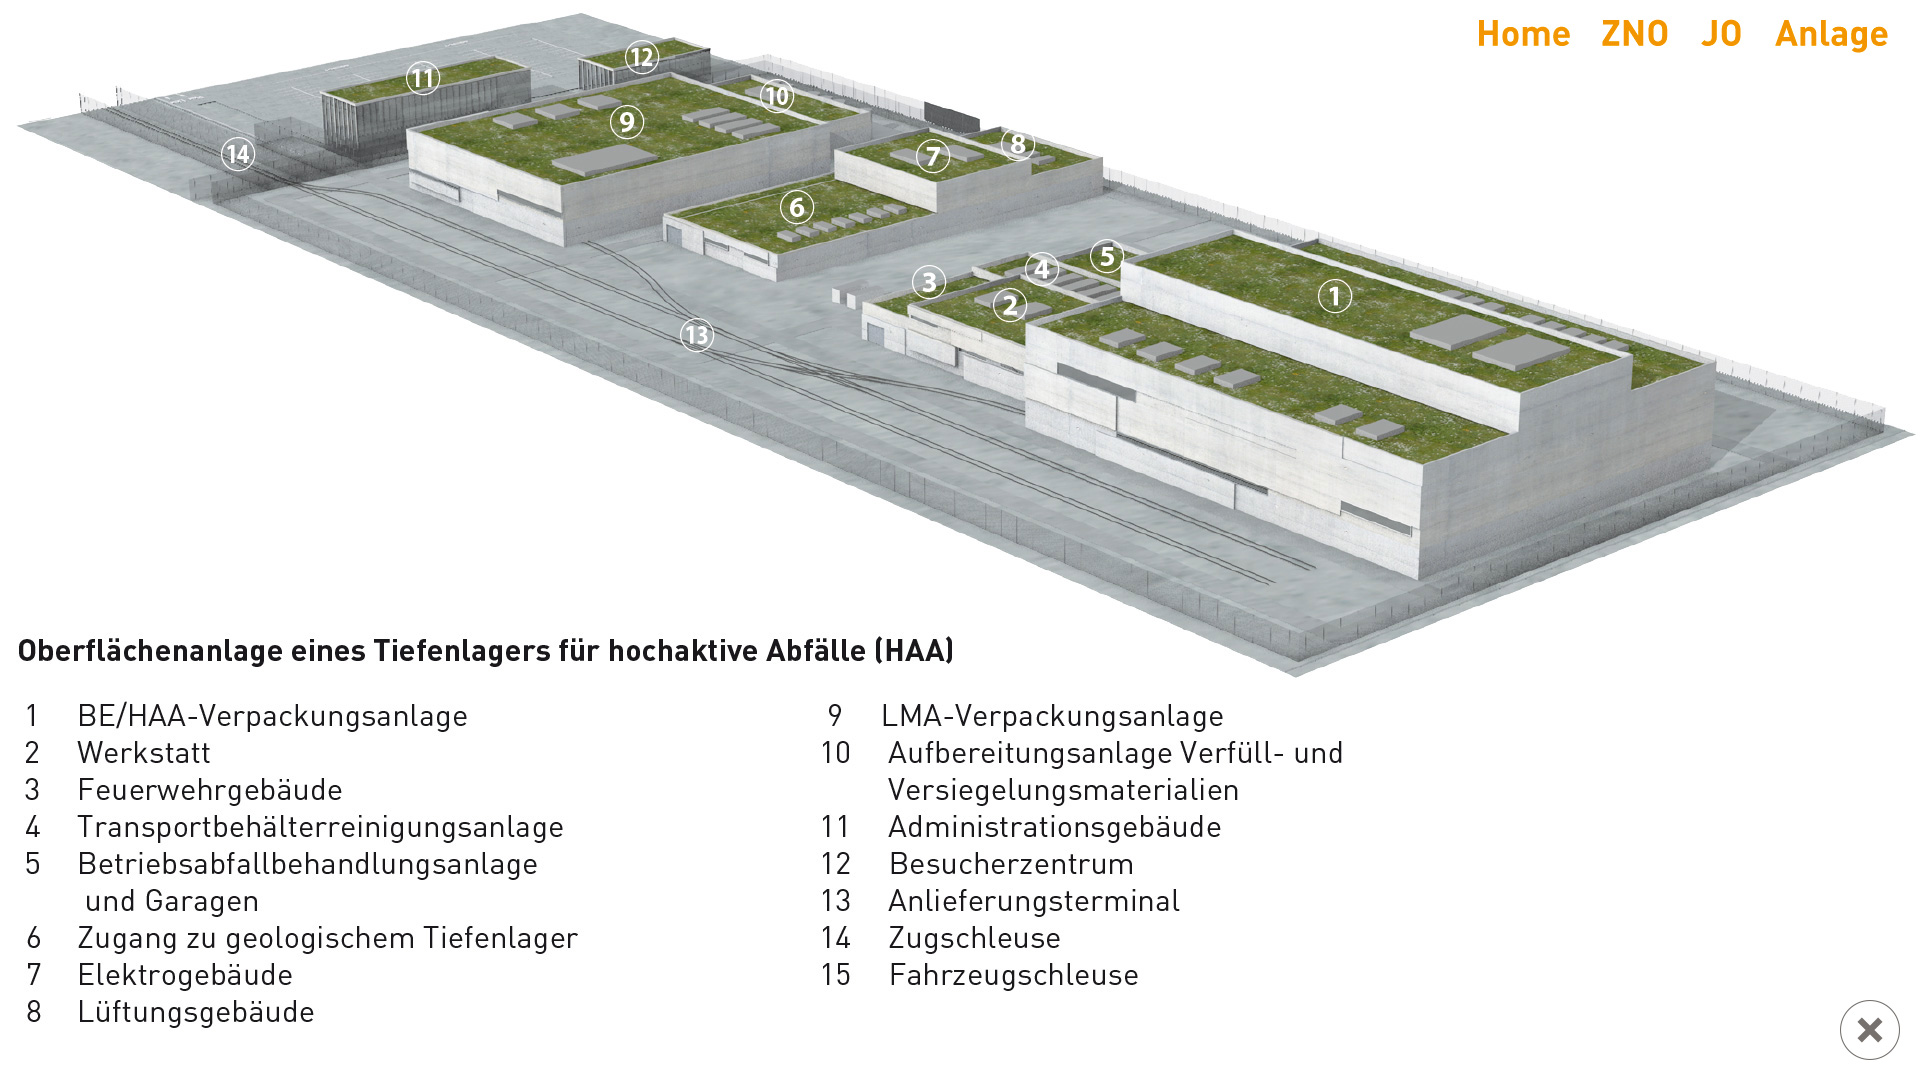 Bild 5 vom Nagra Terminal